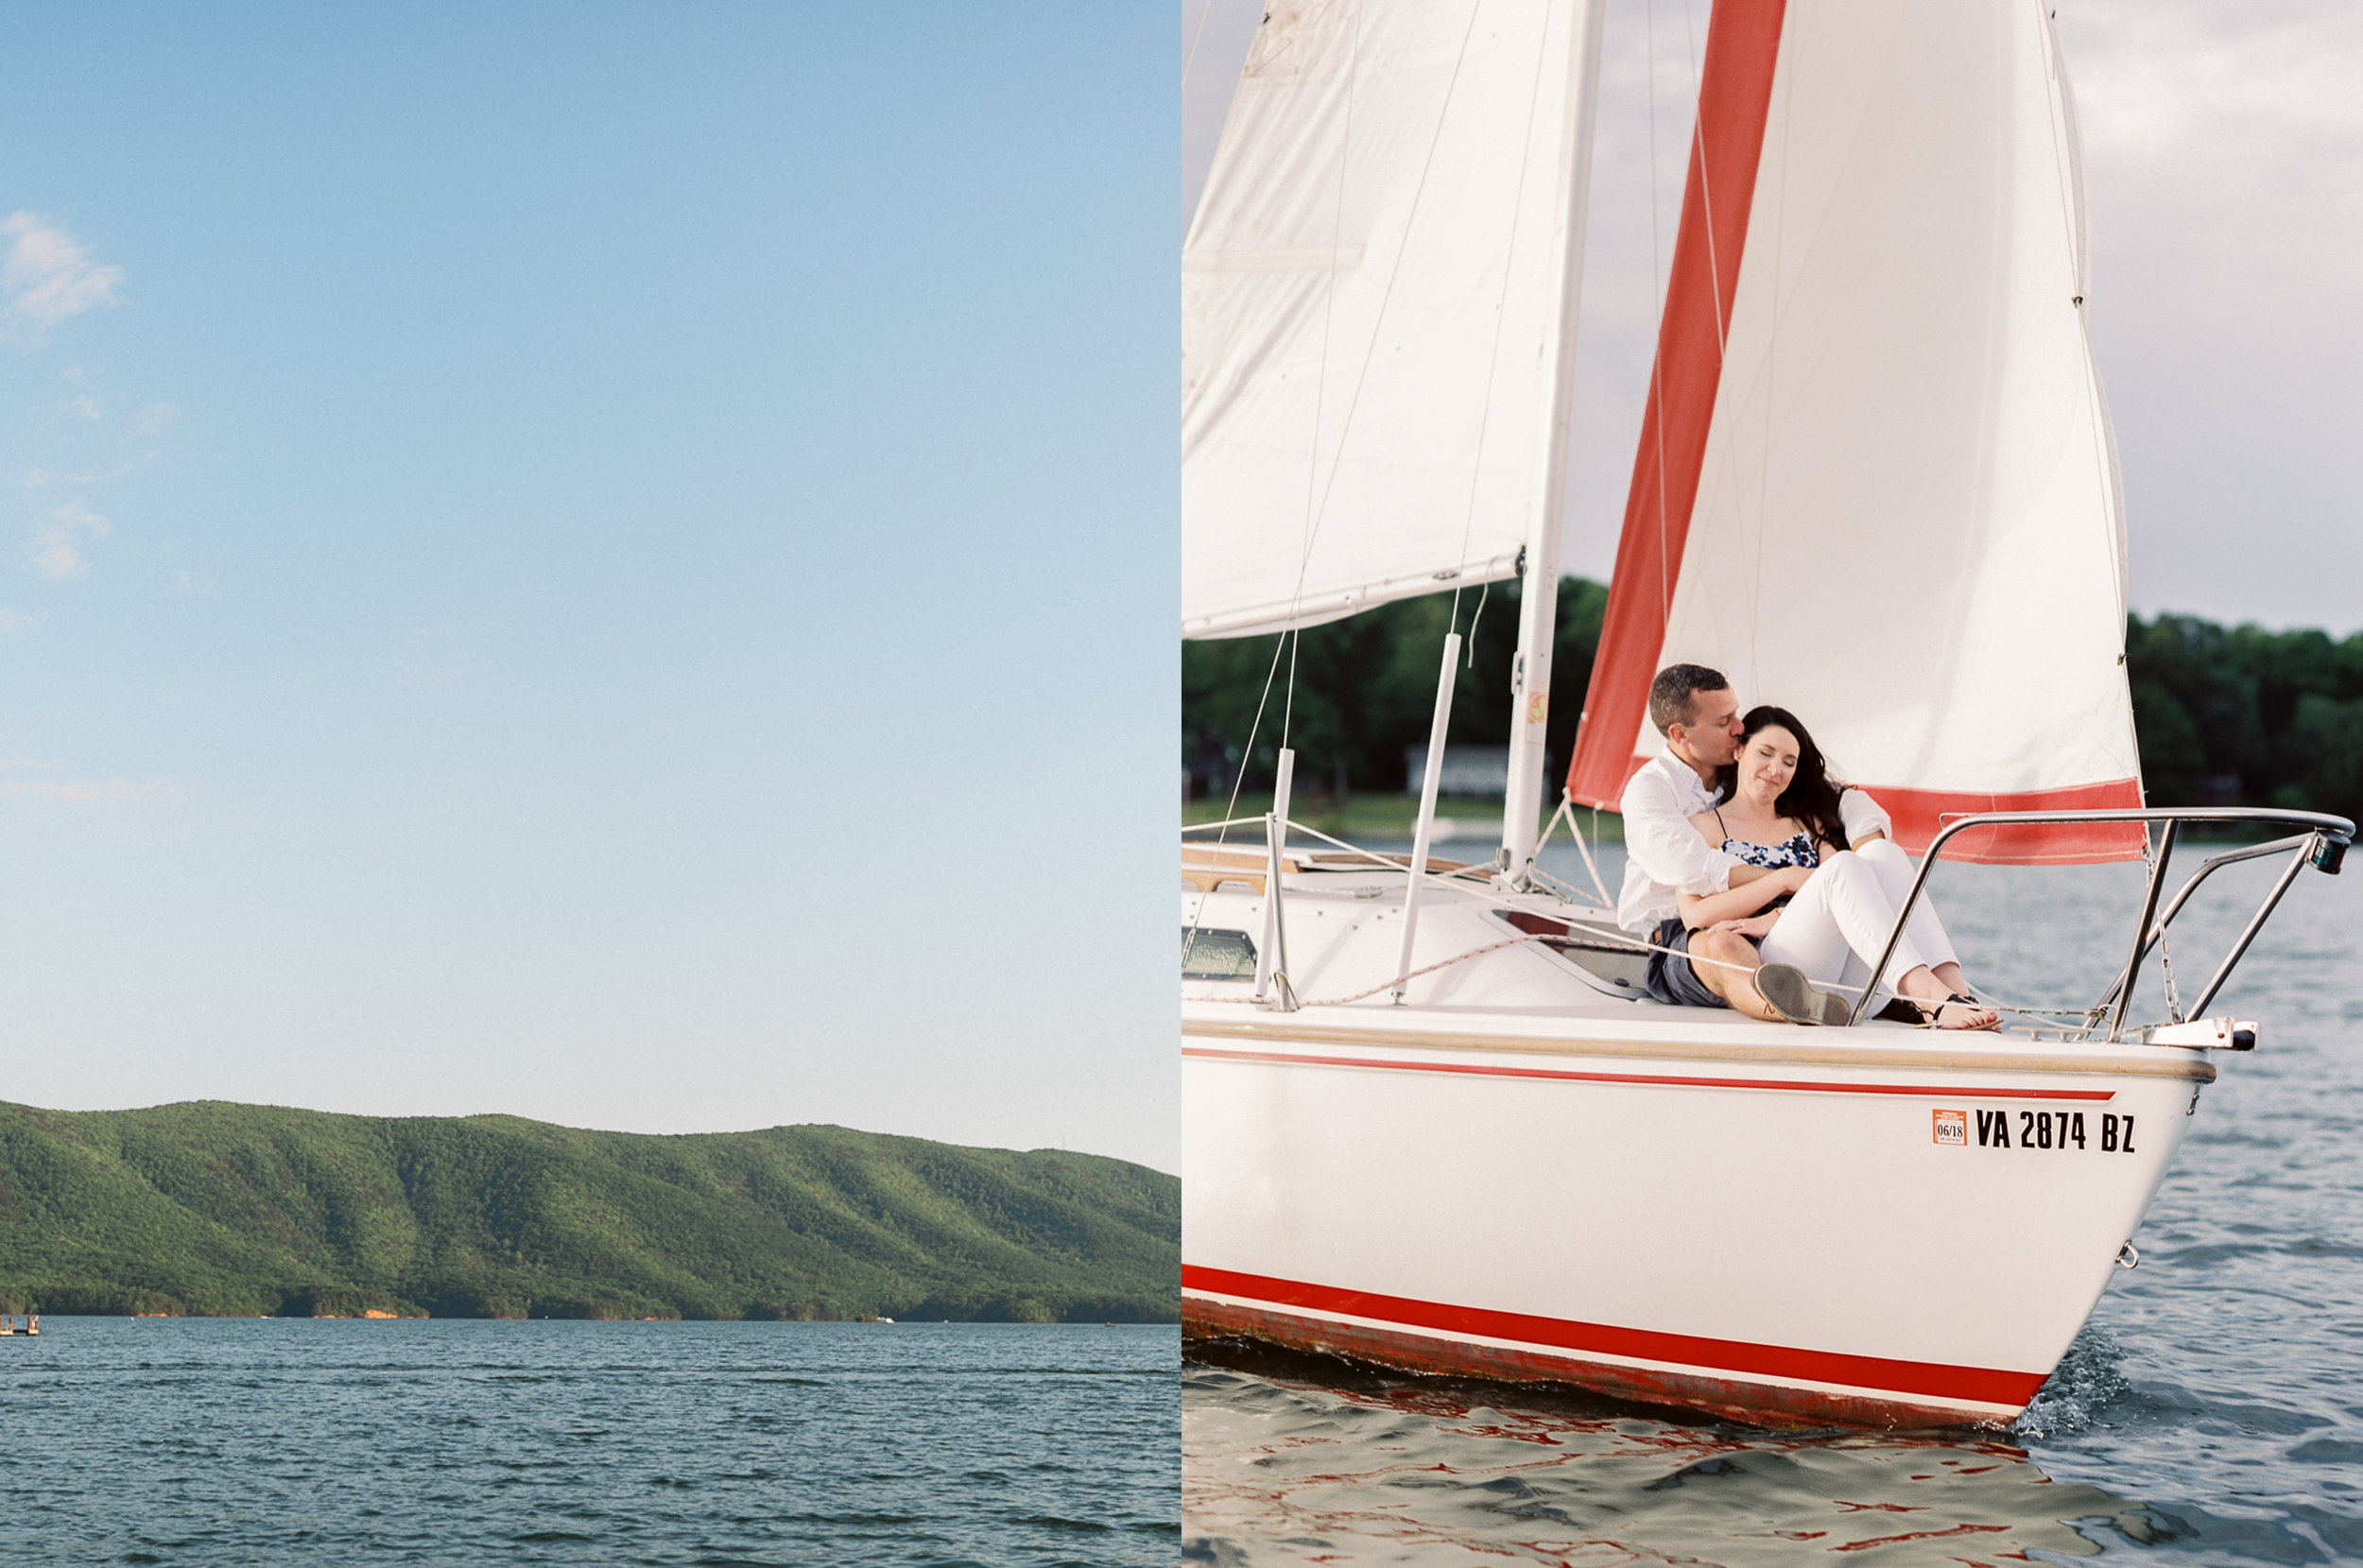 smith-mountain-lake-sailboat-engagement-session-charlotte-sailing-photographer-13.jpg